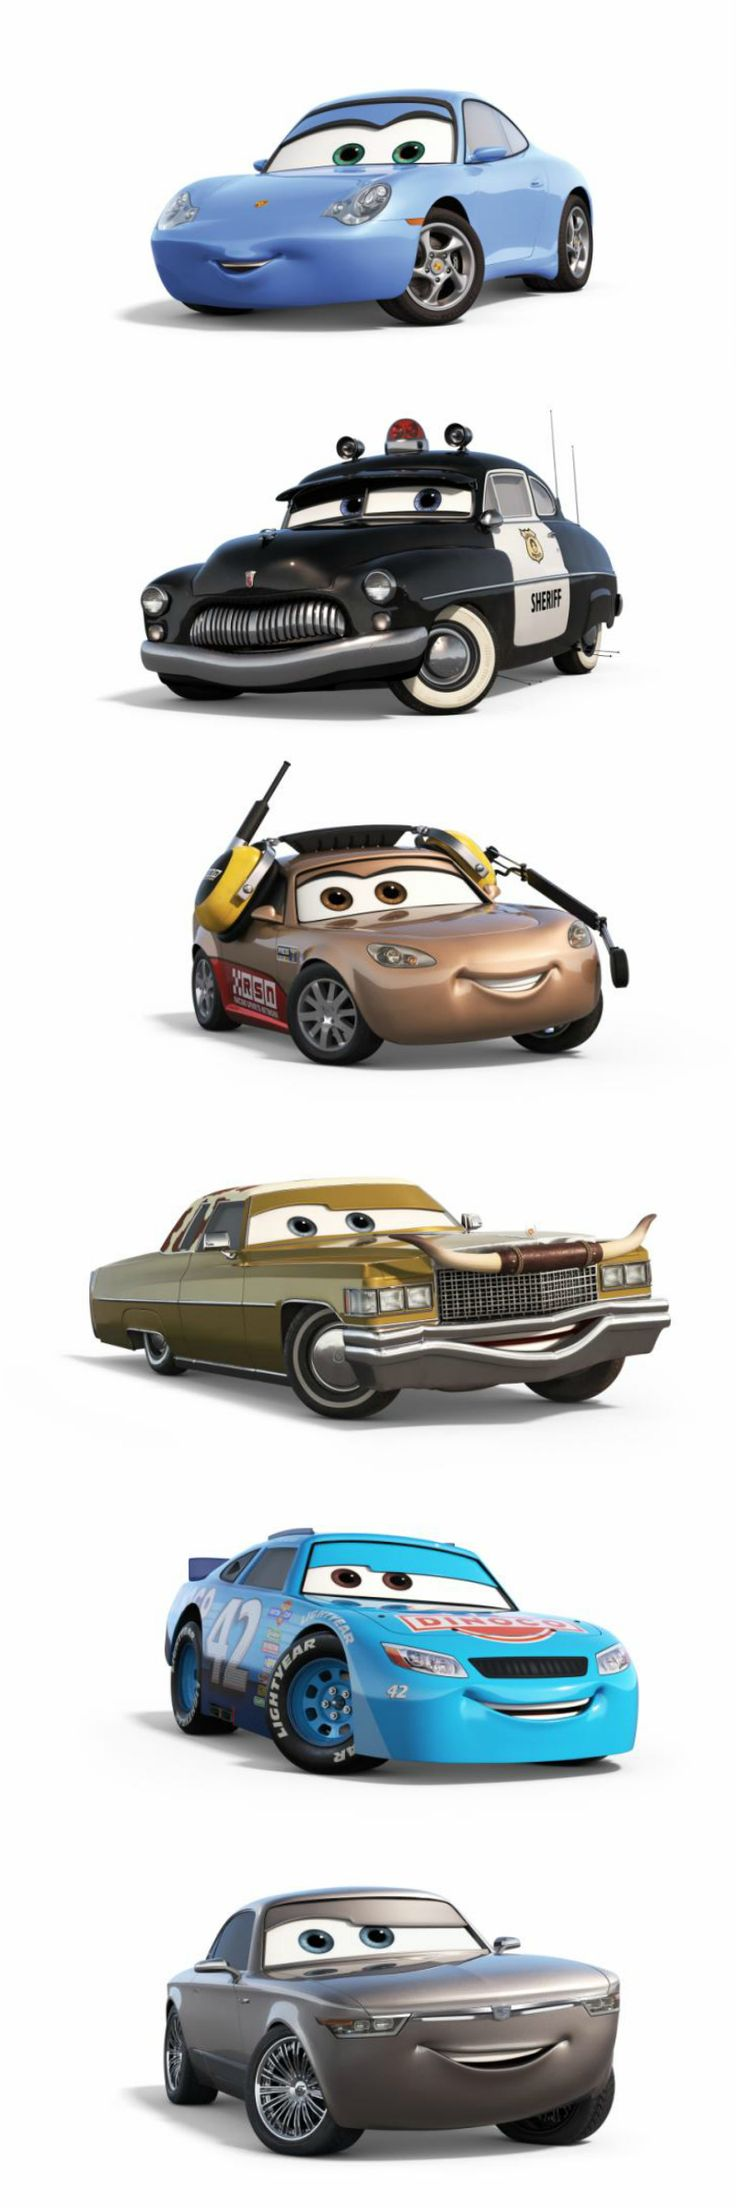 Best Cars Characters Ideas On Pinterest Disney Cars - Lightning mcqueen custom vinyl decals for cardisney pixar cars a walk down cars advertising memory lane take